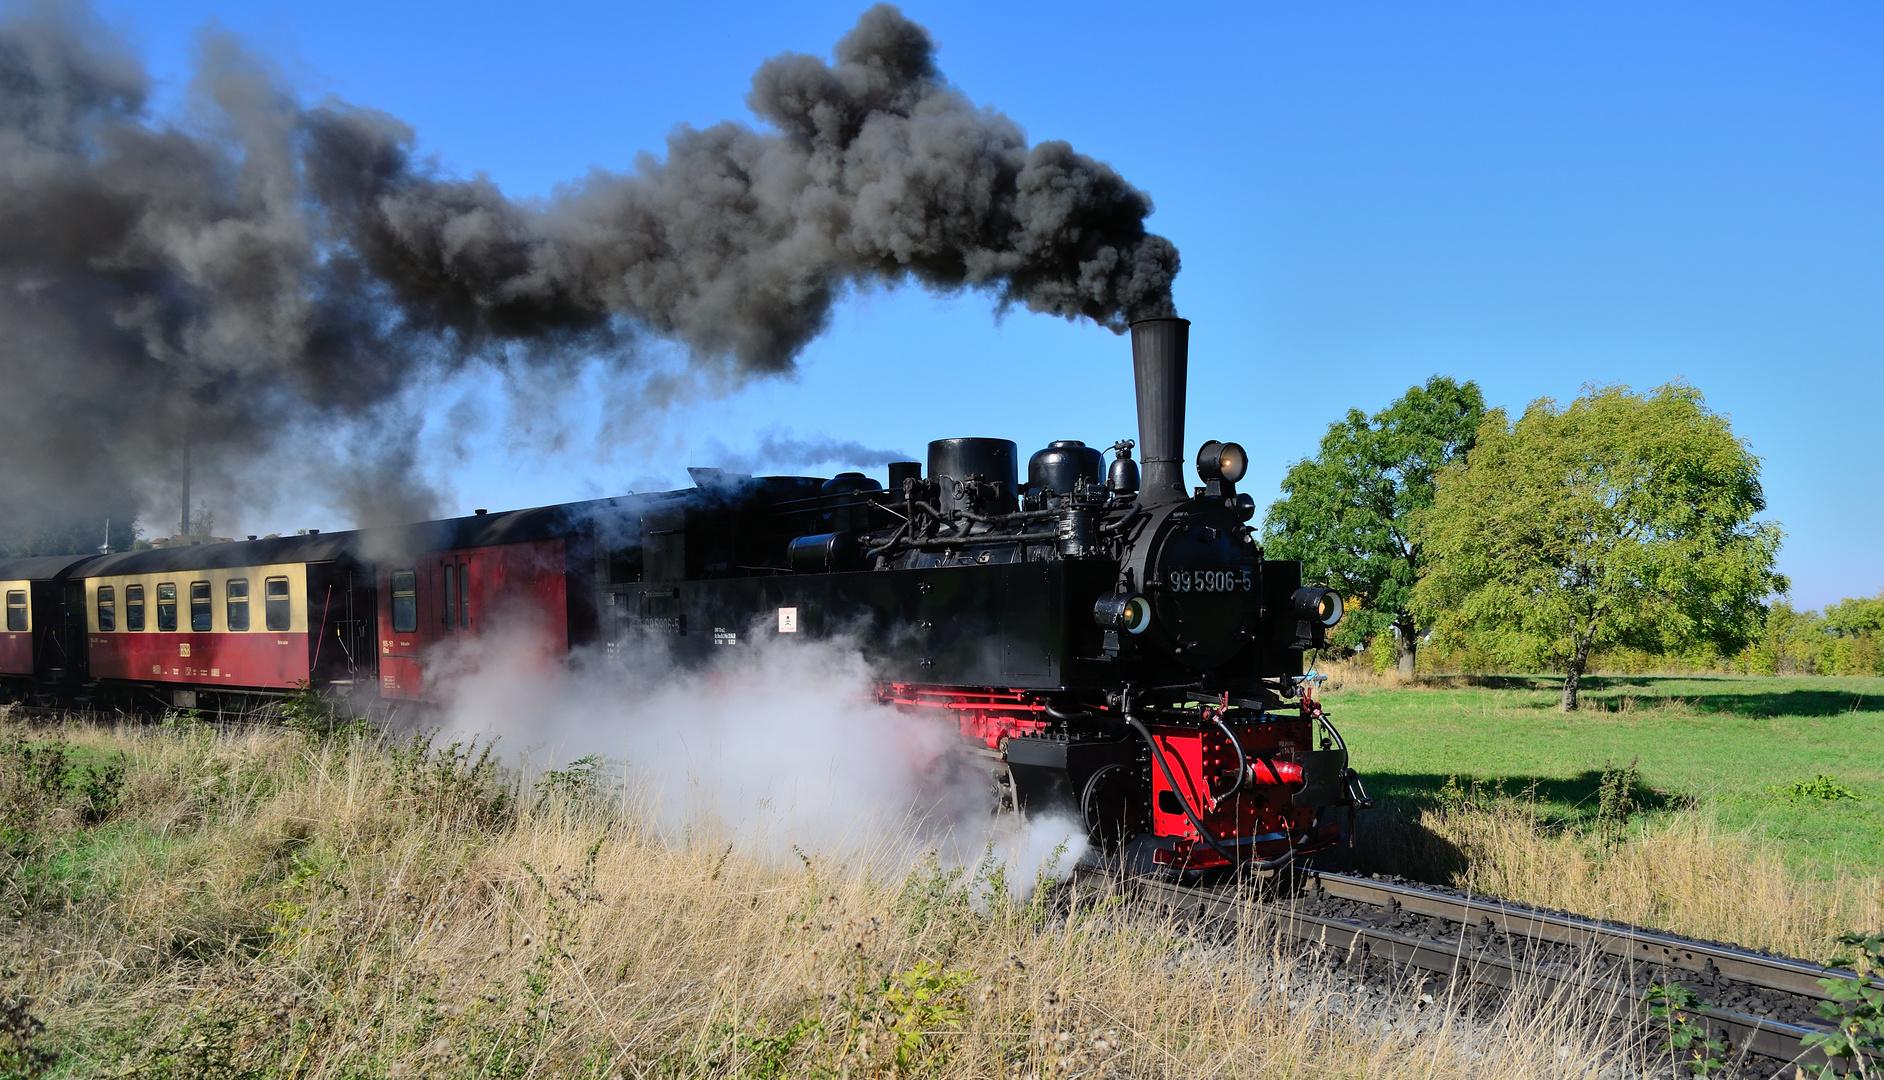 Dampfzug Selketalbahn (1), Oktober 2013